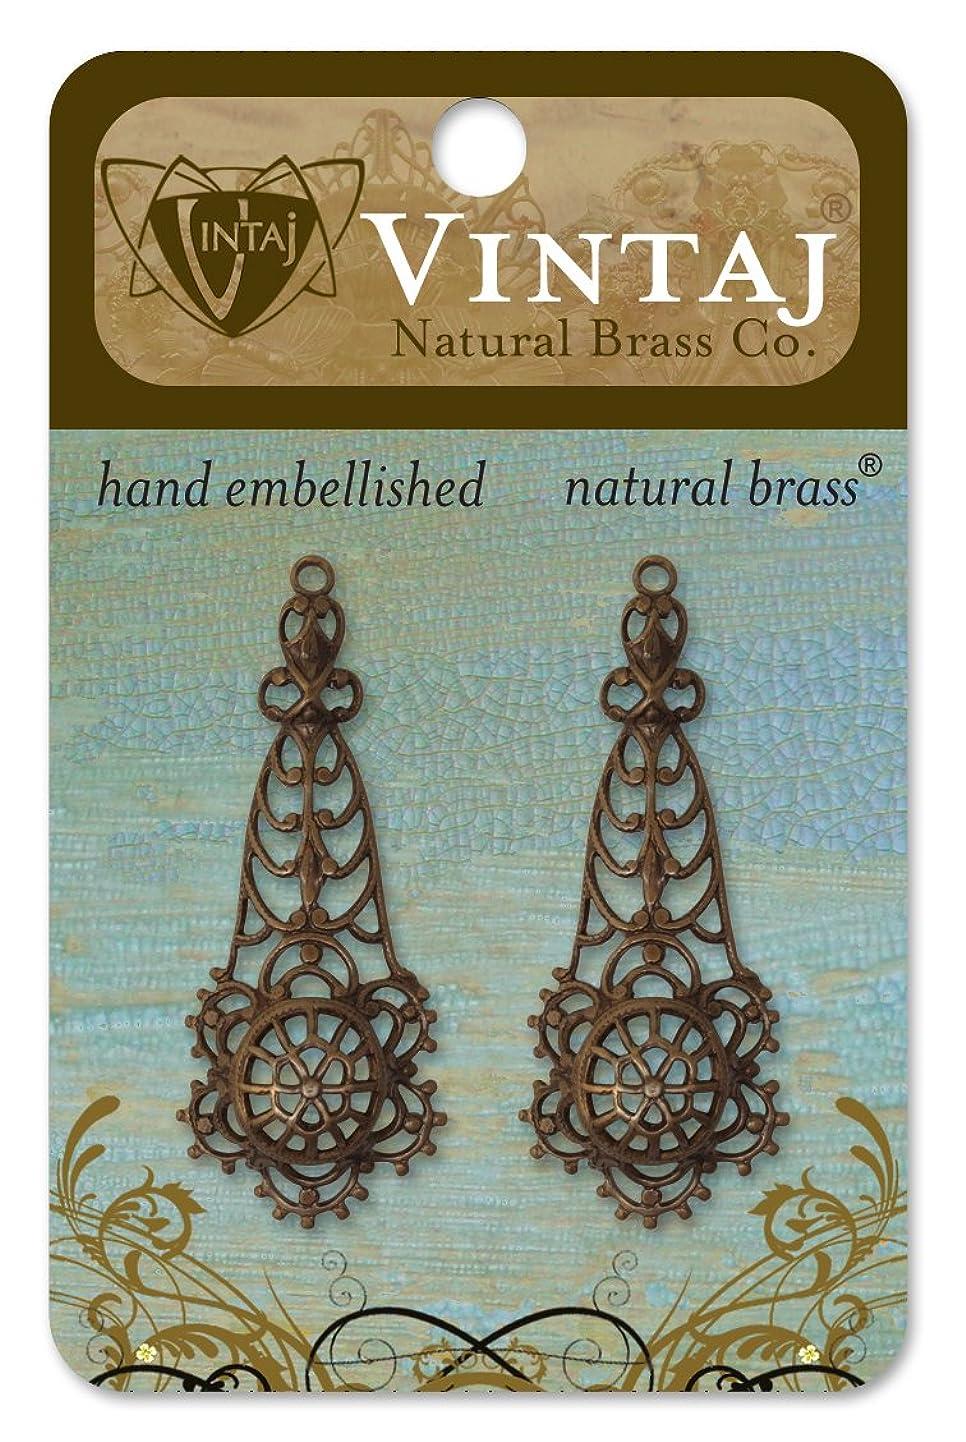 Vintaj 2-Piece Alchemy Decorative Pendant, 44 by 24mm lcztumradcb0